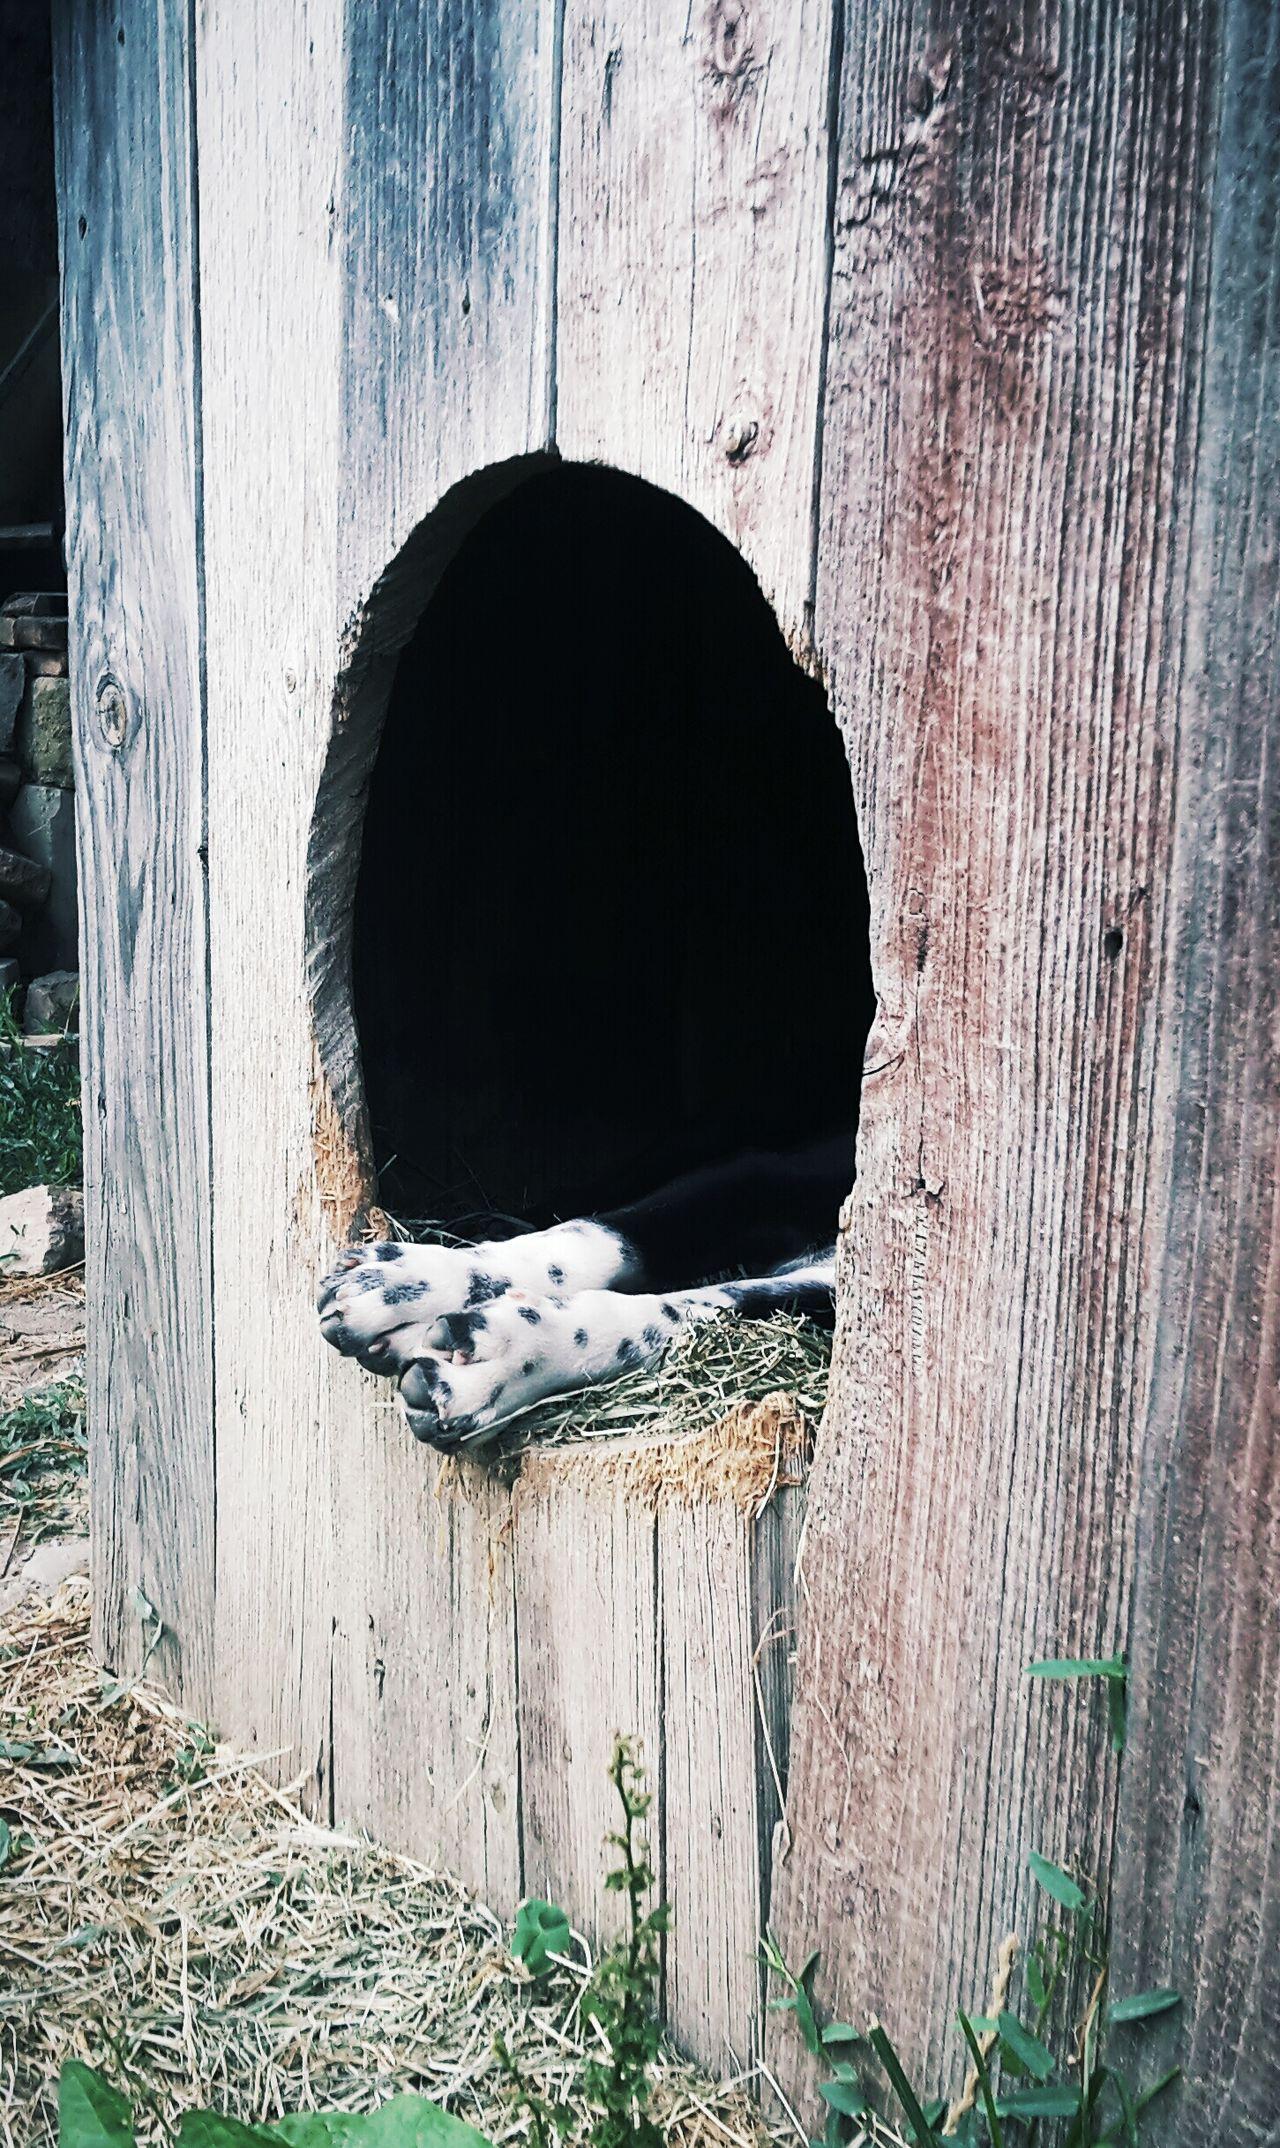 Outdoors Wooden Weathered Beagle Love Sleeping Beagleworld Beaglelife